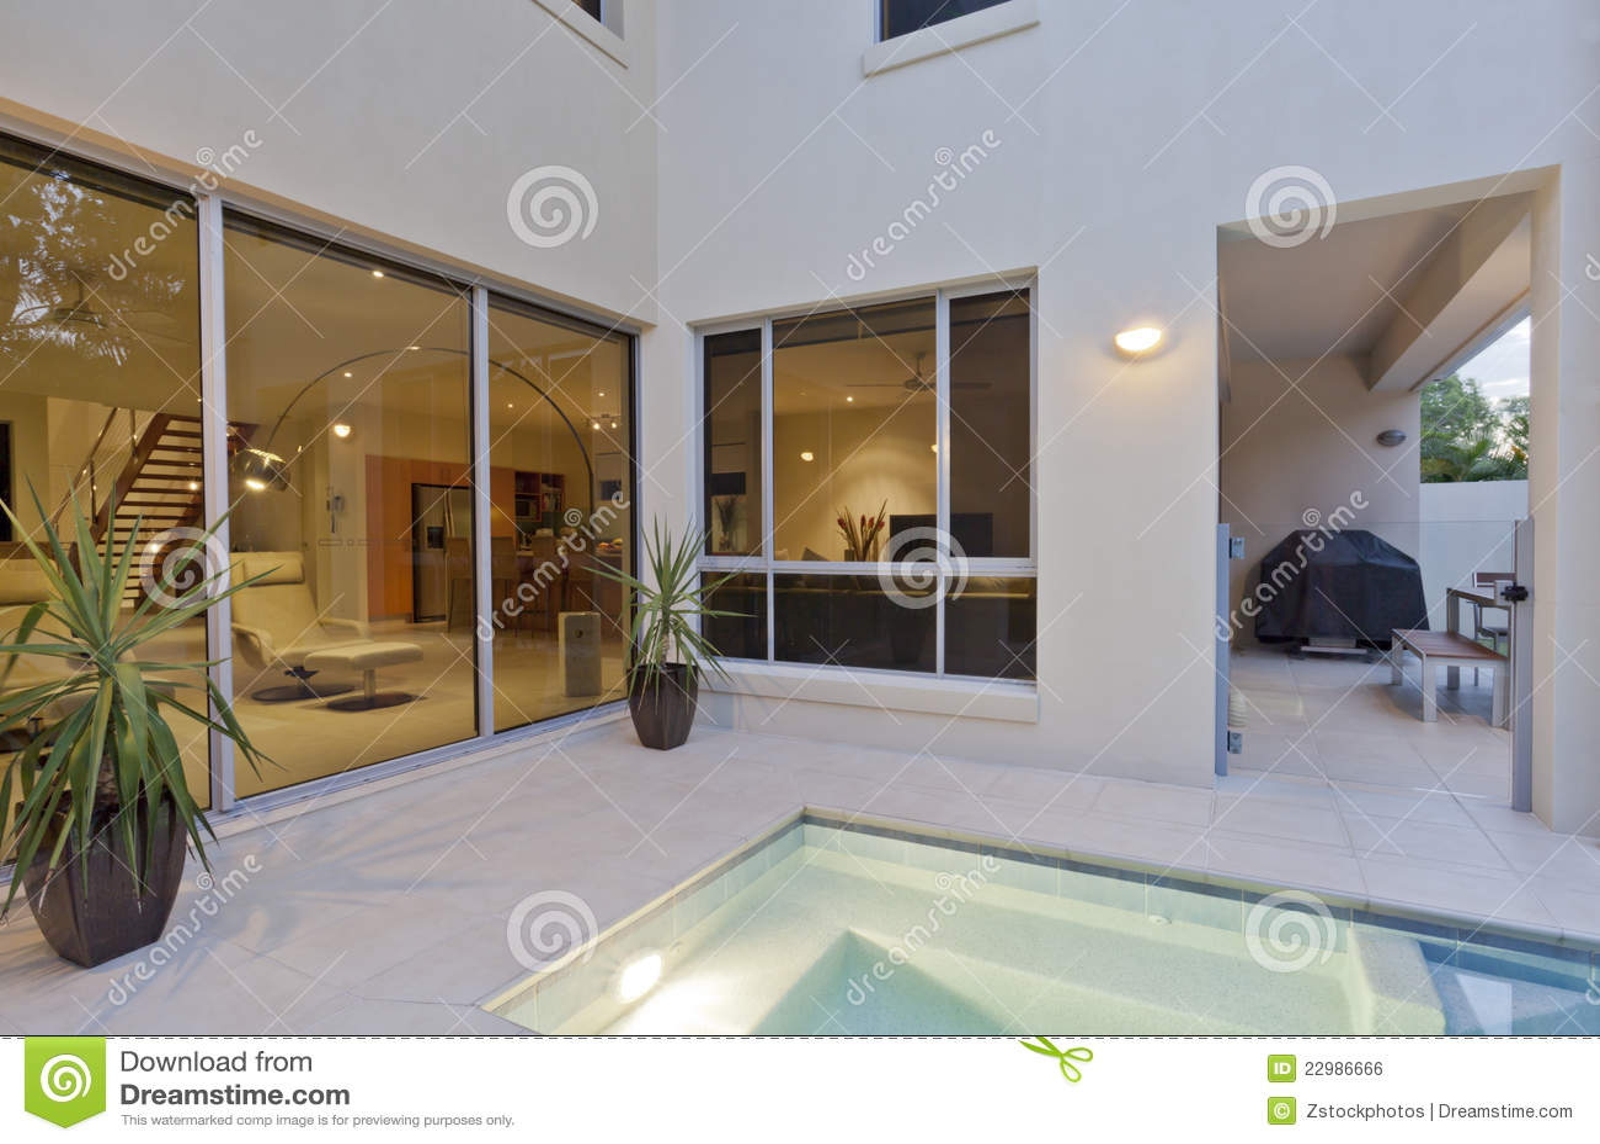 Modern House With Living oom nd Backyard oyalty Free Stock ... - ^